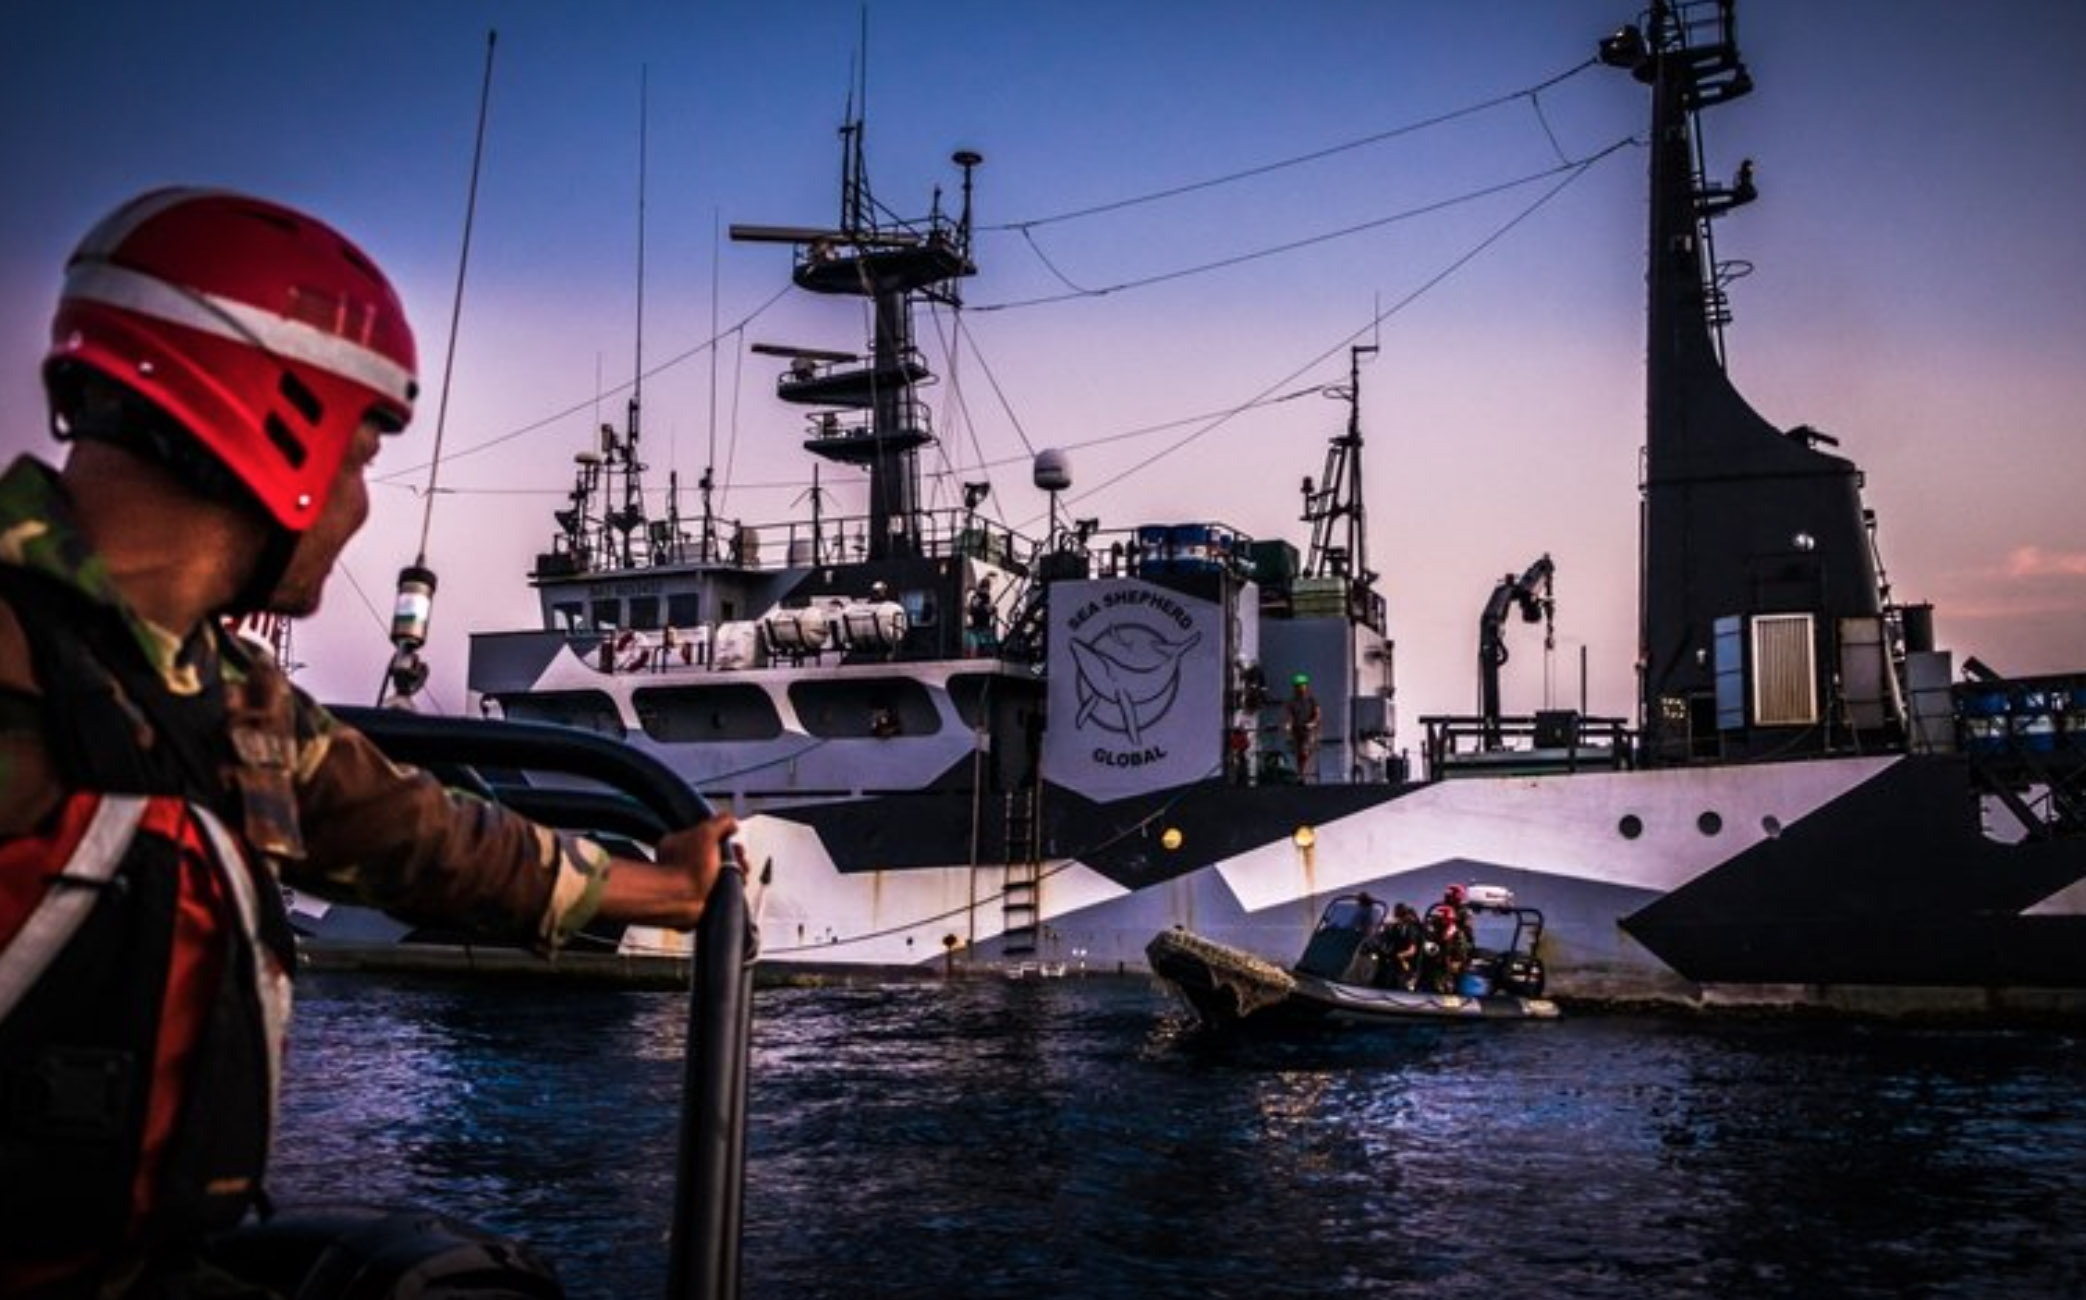 Image: Melissa Romao/Sea Shepherd